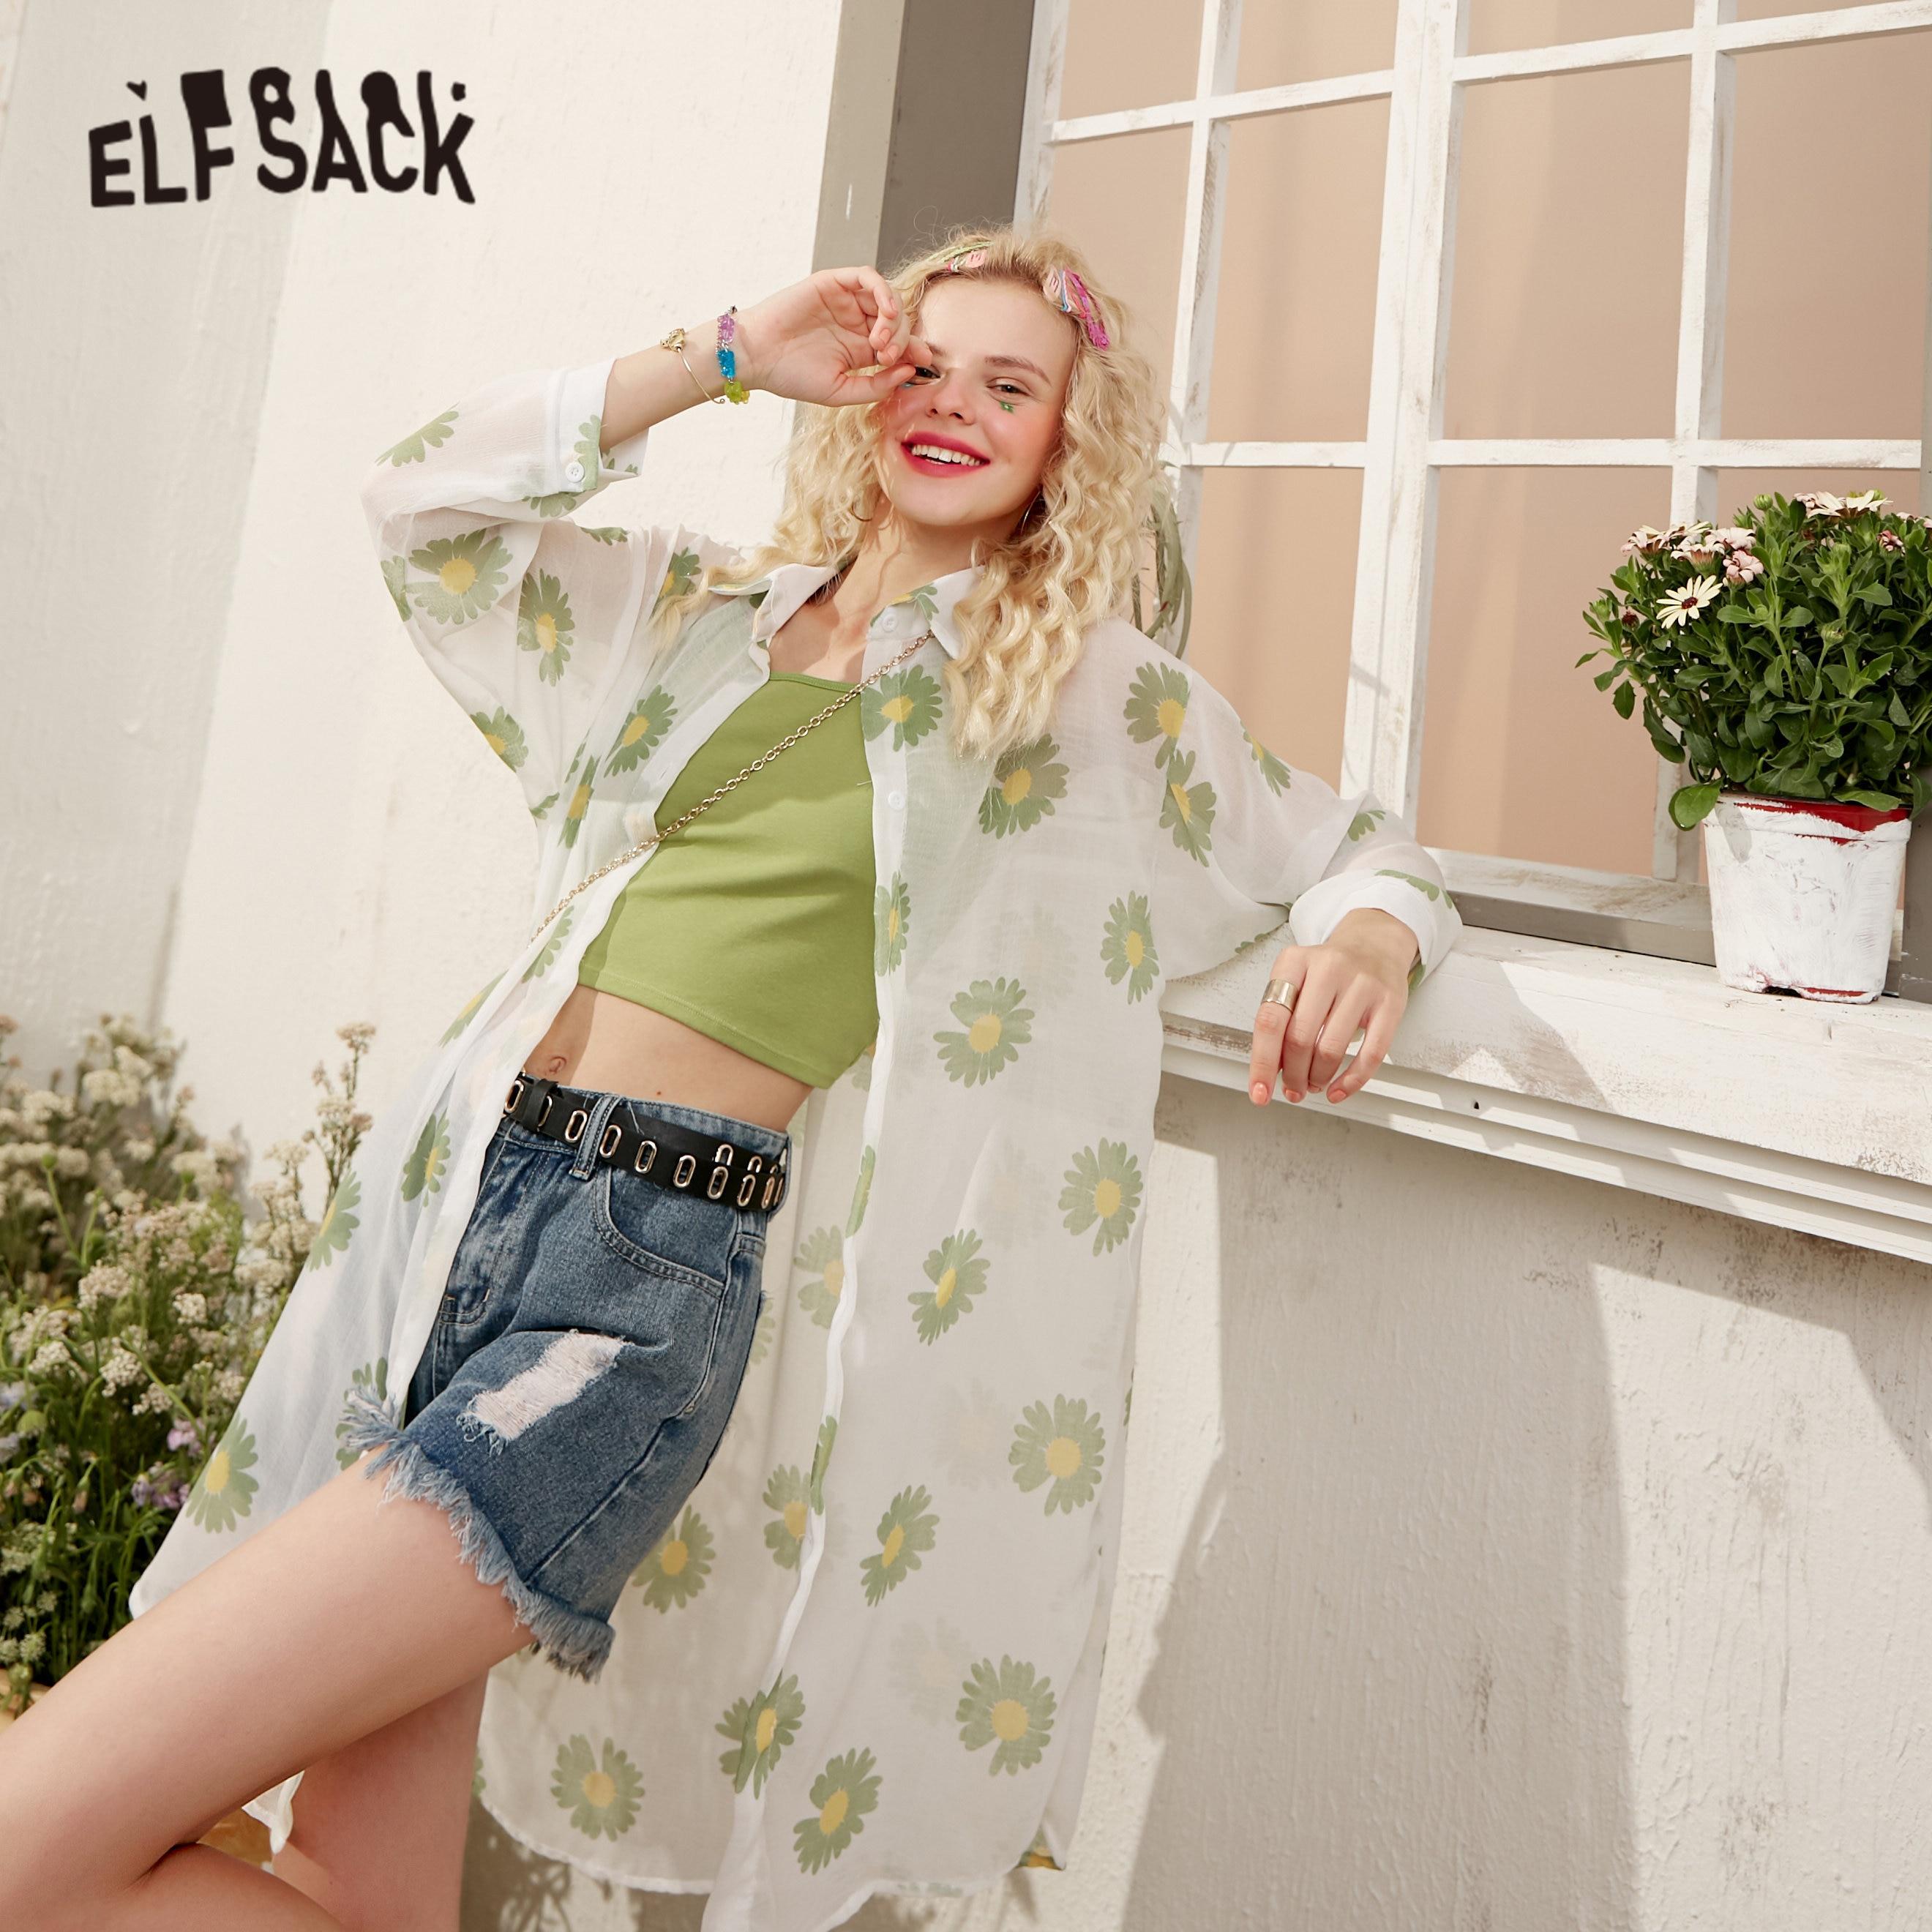 ELFSACK Green Daisy Flowers Casual See-Through Shirts Women 2020 Summer ELF Orange Long Sleeve Korean Ladeis Daily White Tops